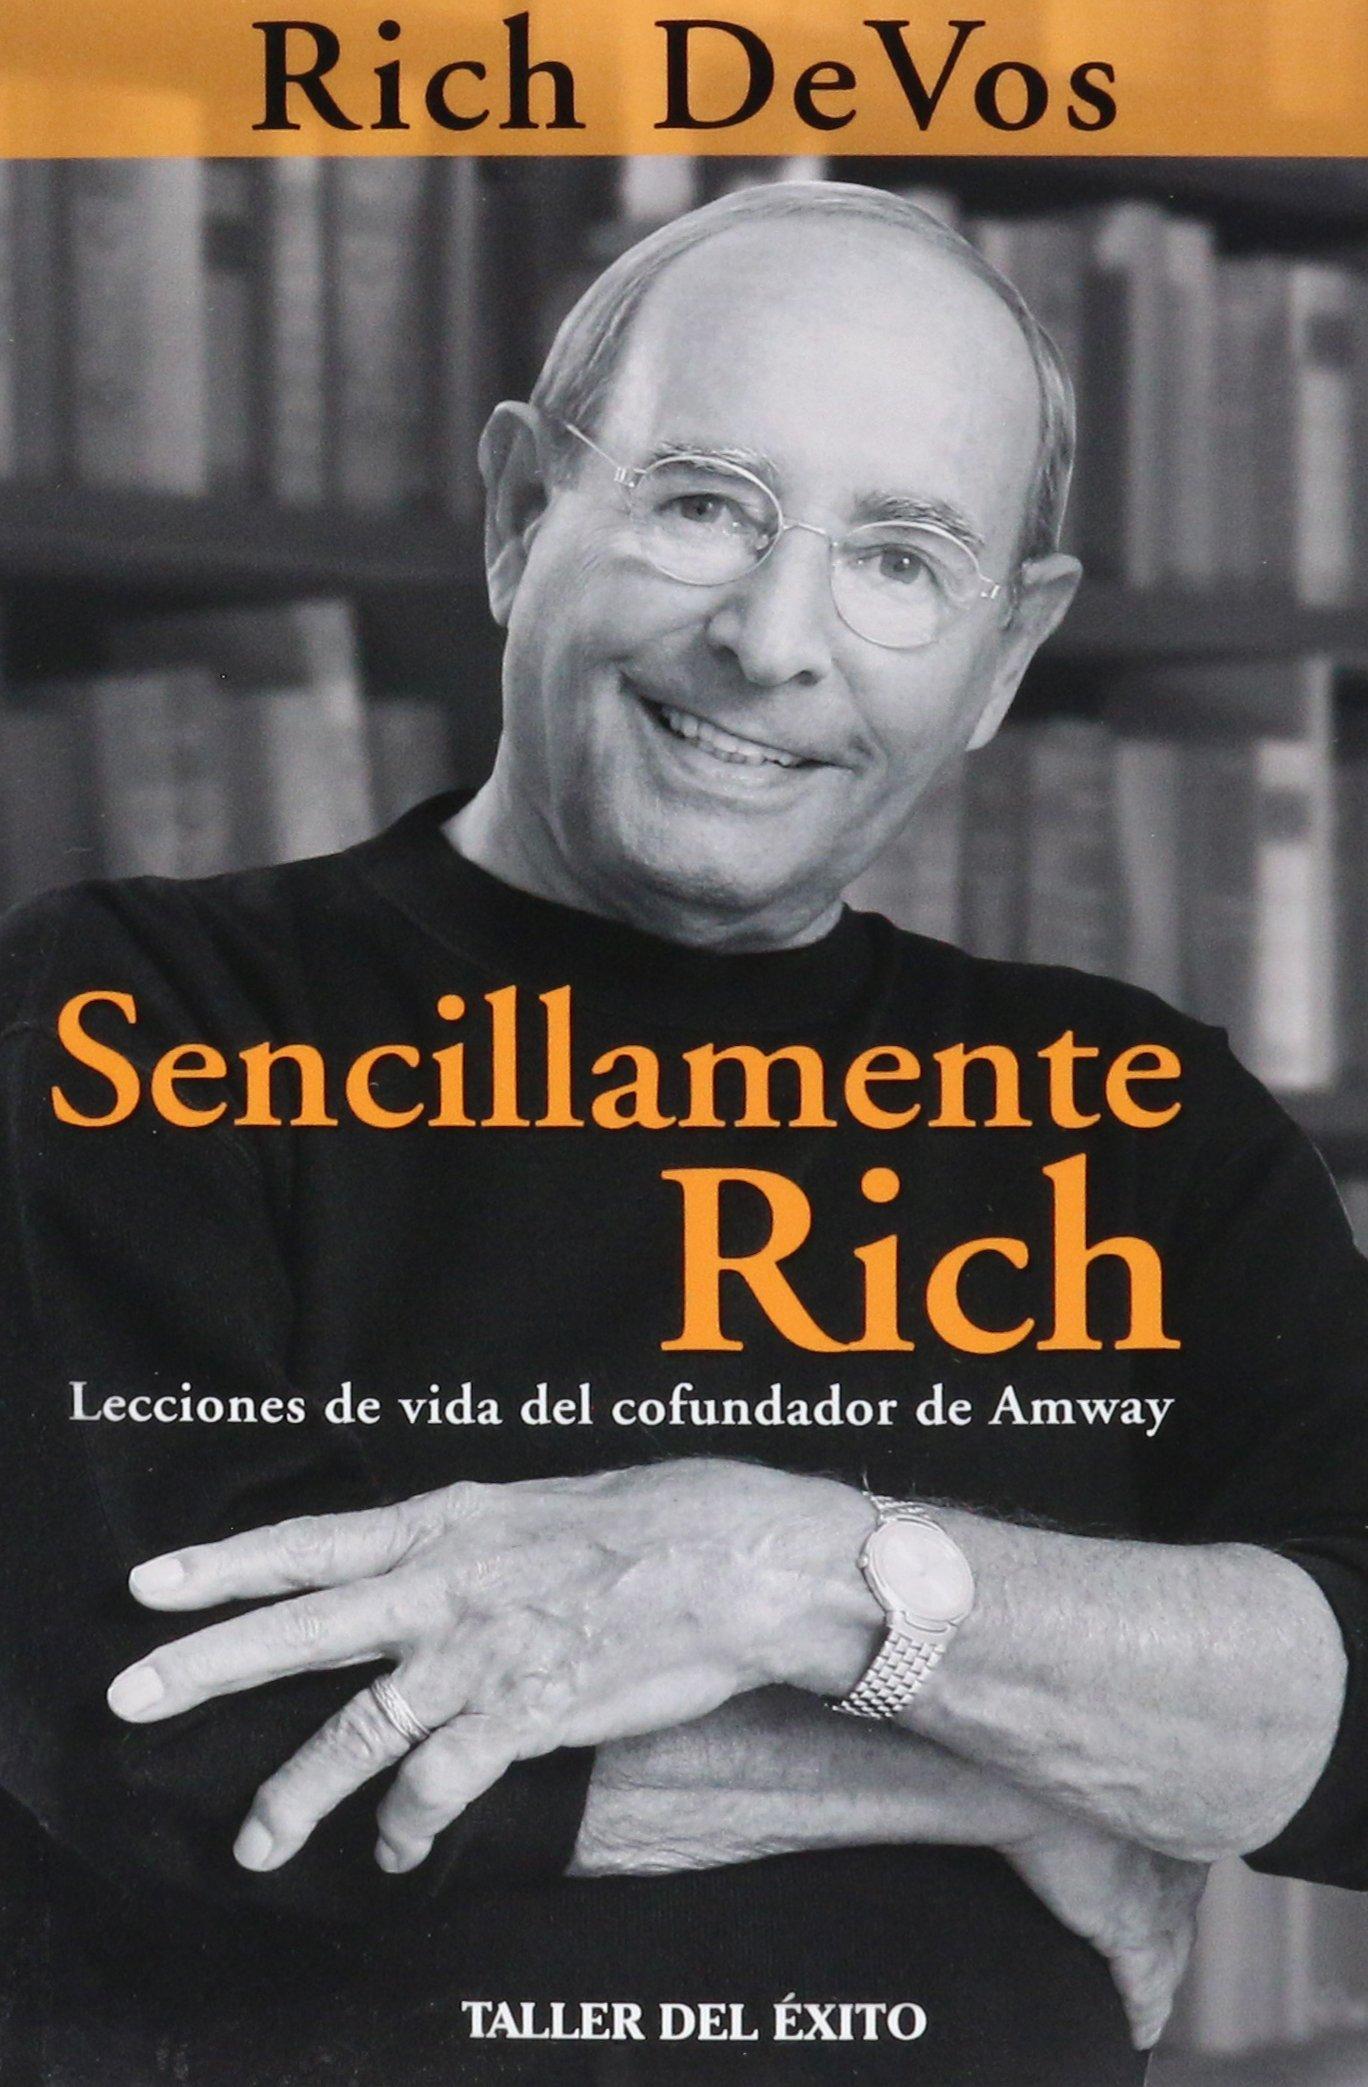 Simplemente rich rich devos 9781607383383 amazon books fandeluxe Gallery